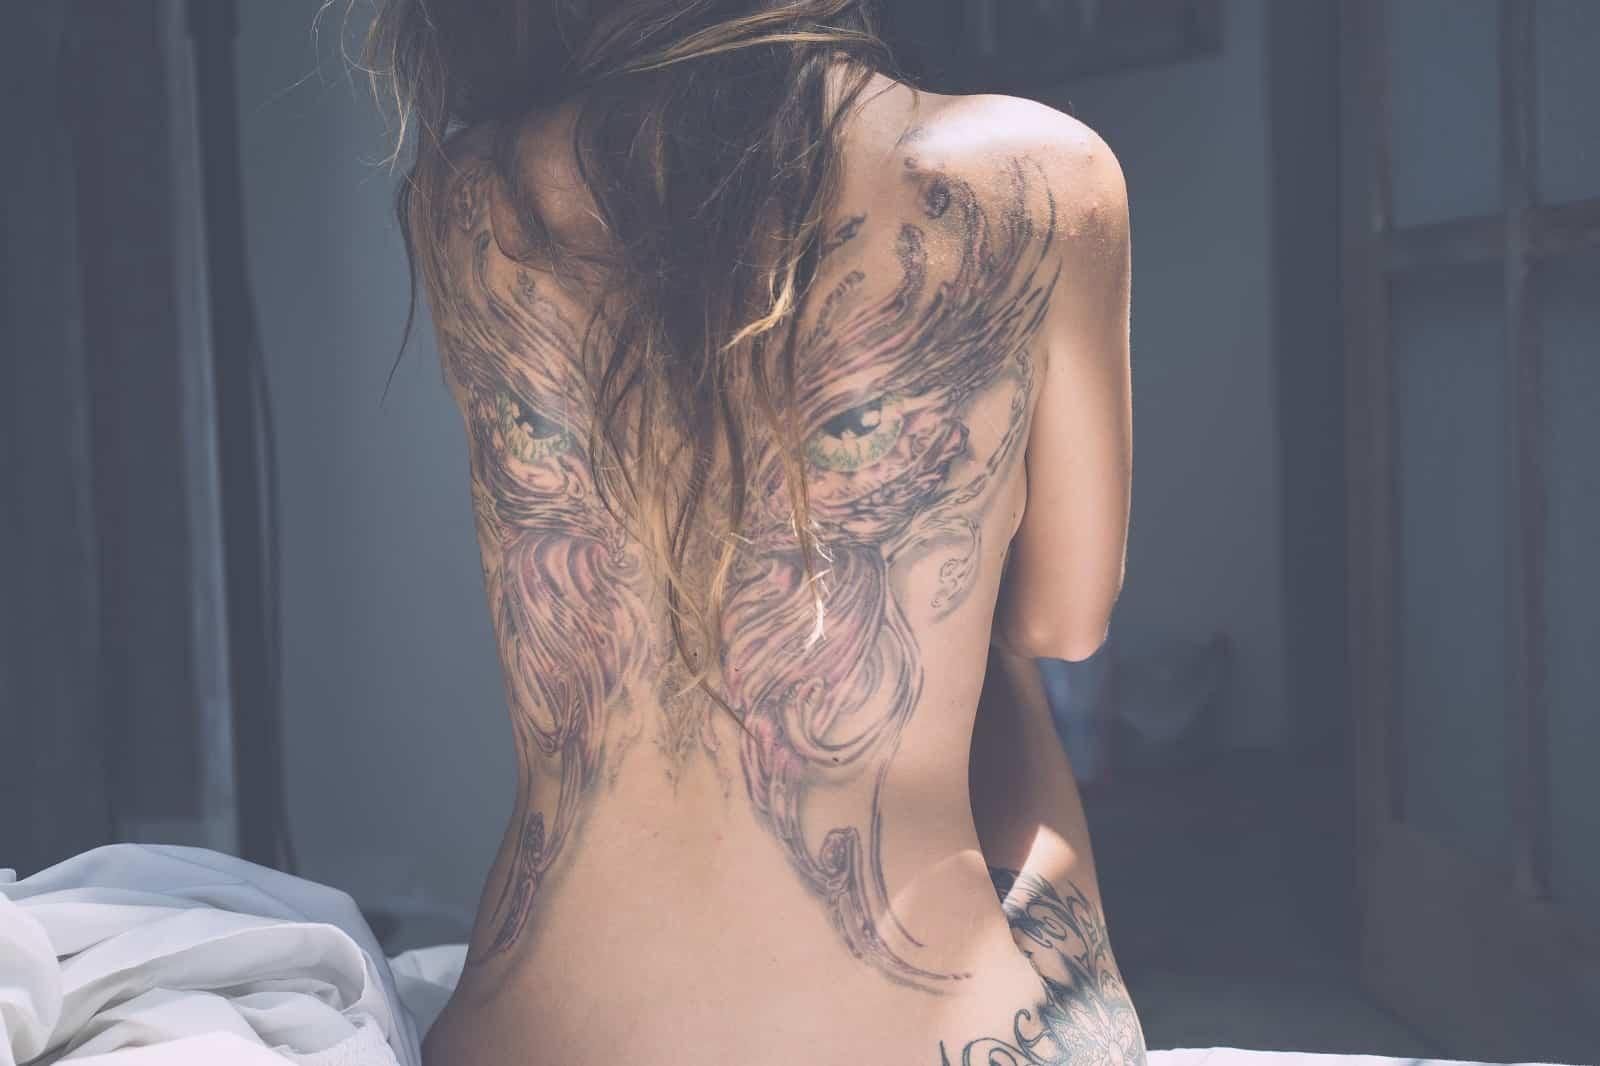 Top 20 Best Tattoo Ideas For Girls On Back In 20   Tattooed Martha